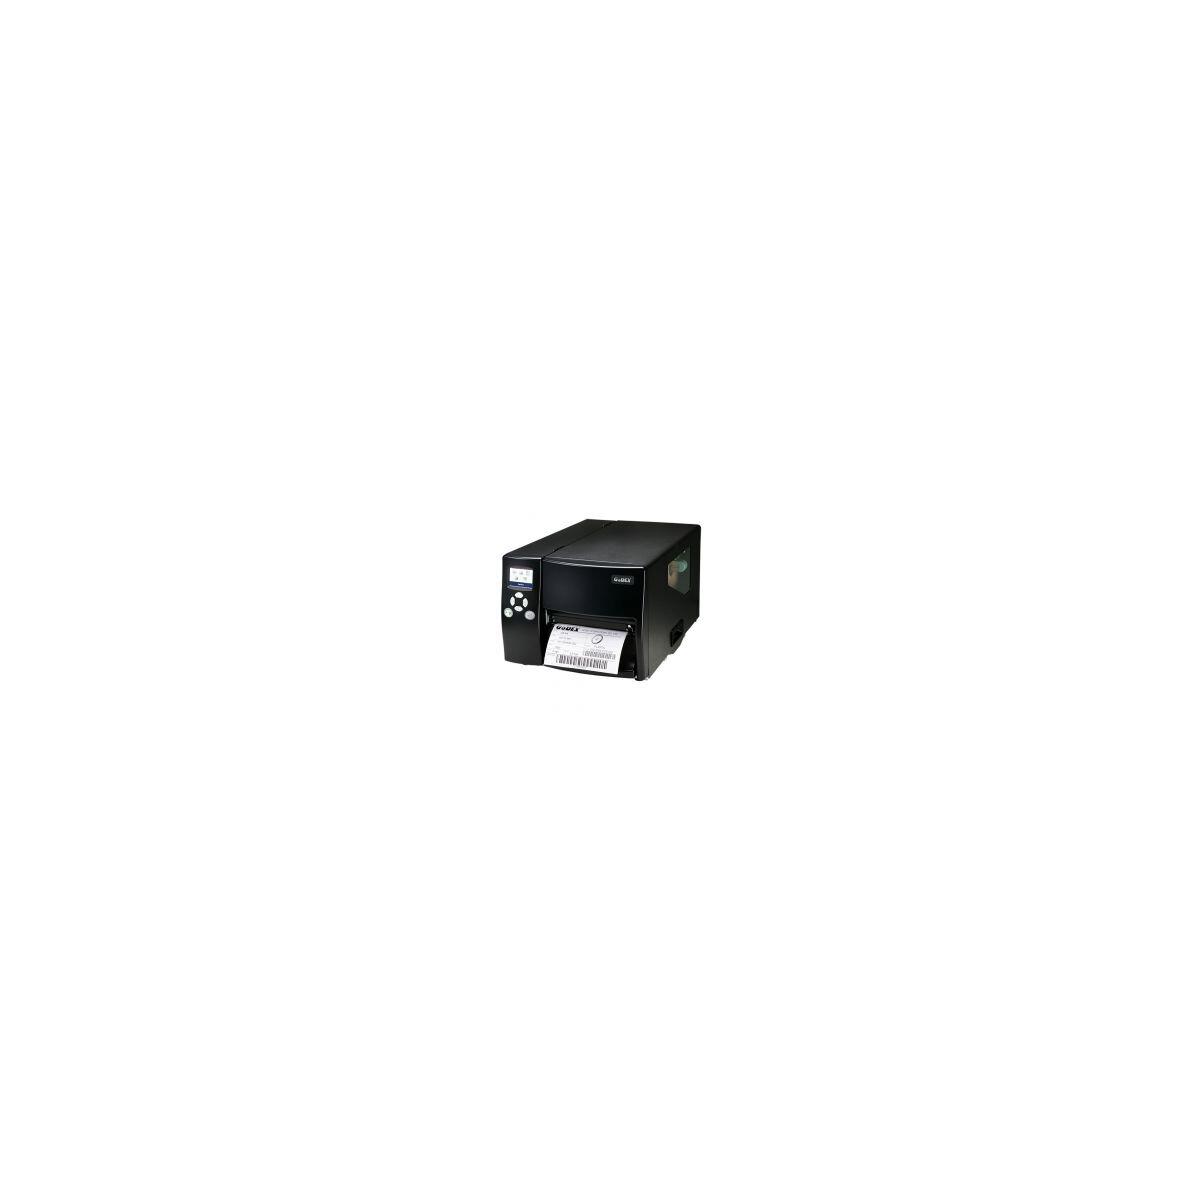 Godex Drucker EZ-6250i - Basisgerät mit Abreißkante